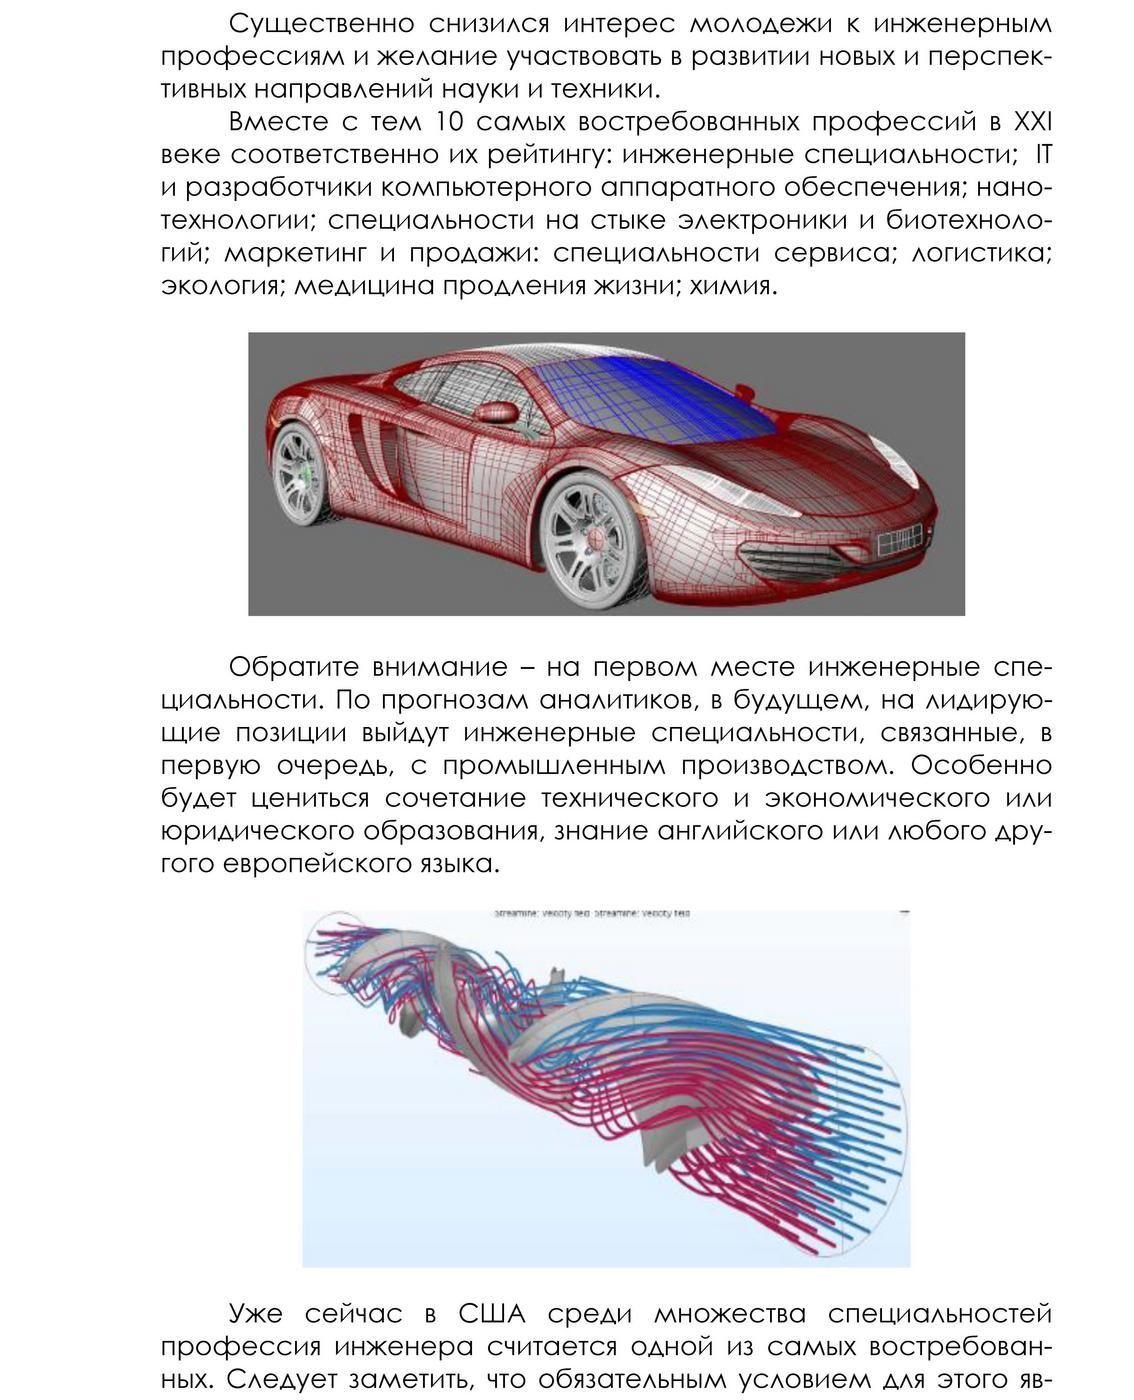 statya_na_sayt_mtf-cutorma_shm_stranica_2.jpg